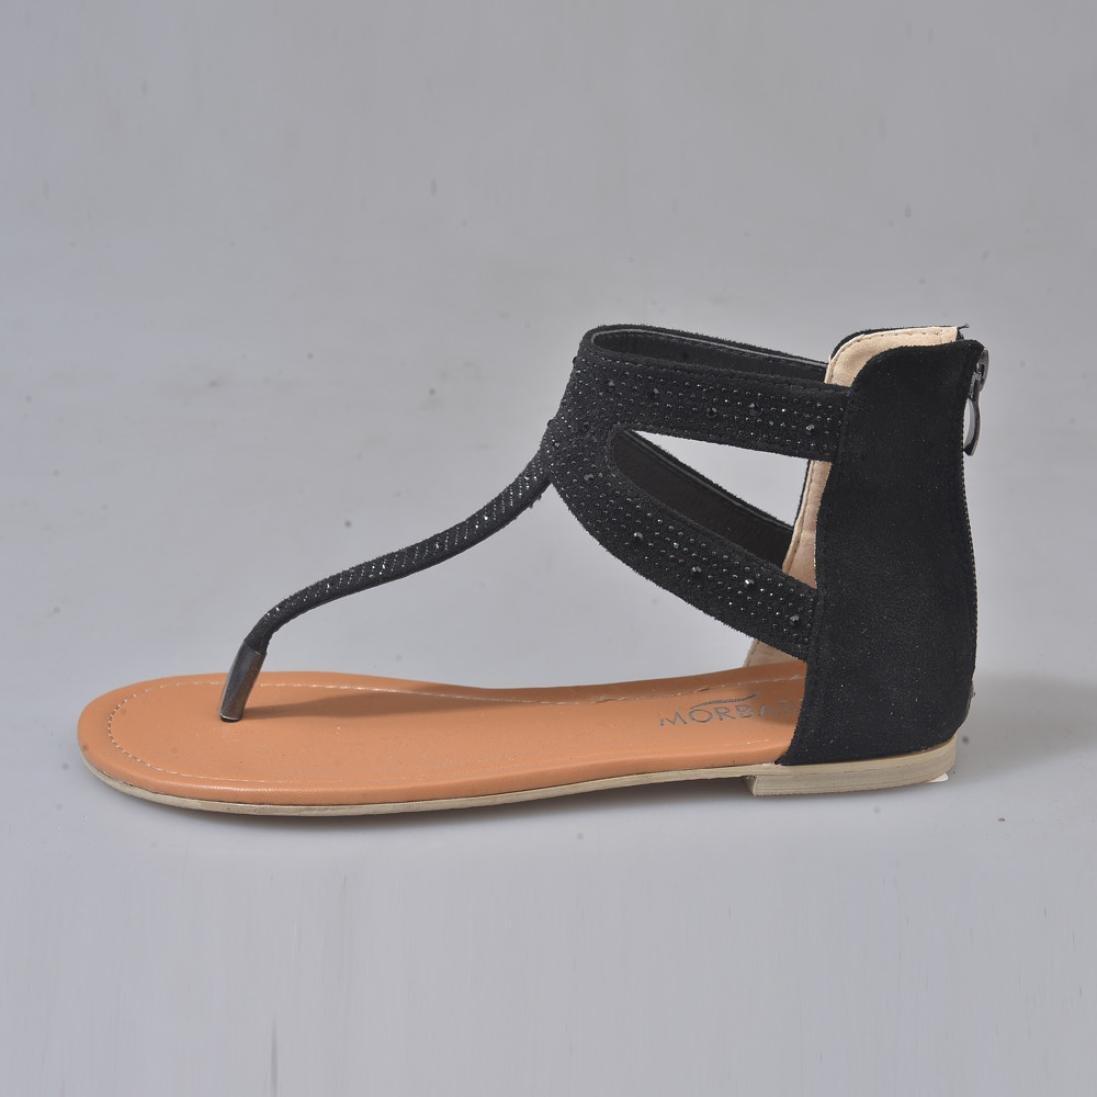 Amazon.com: Han Shi moda sandalias, mujer diamante cierre ...